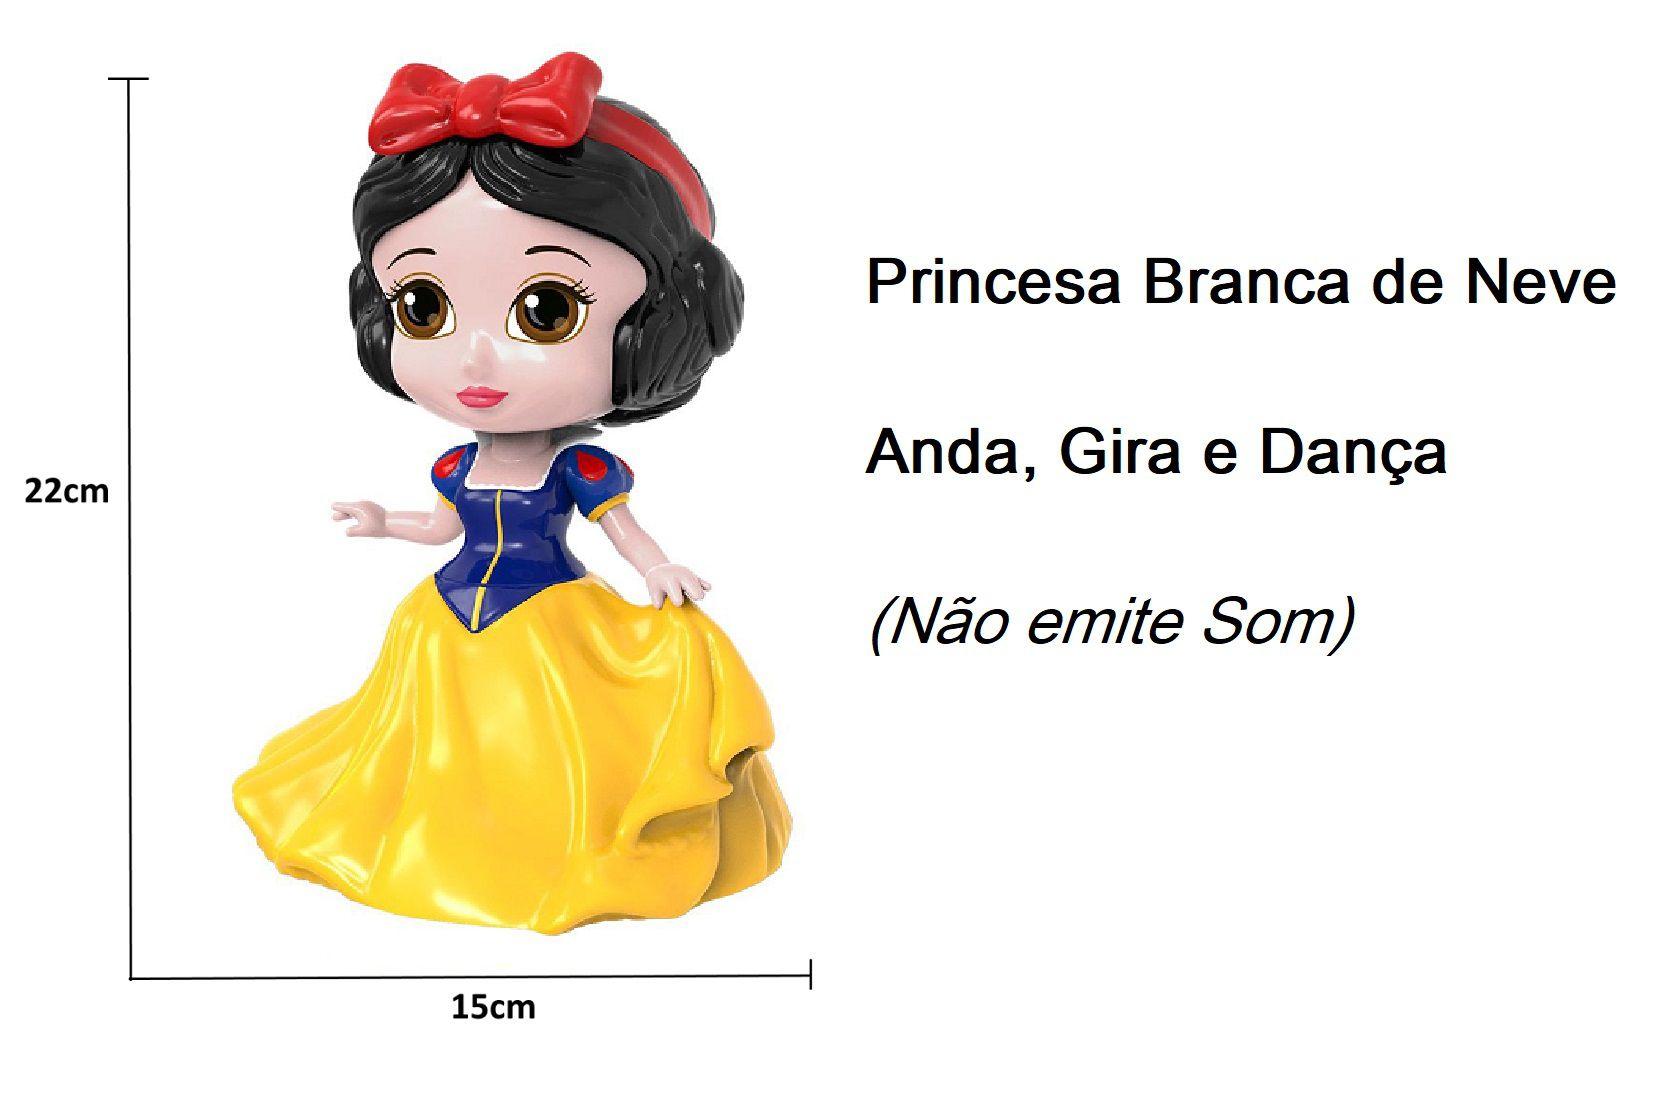 Boneca Dançarina Princesa Branca de Neve Disney